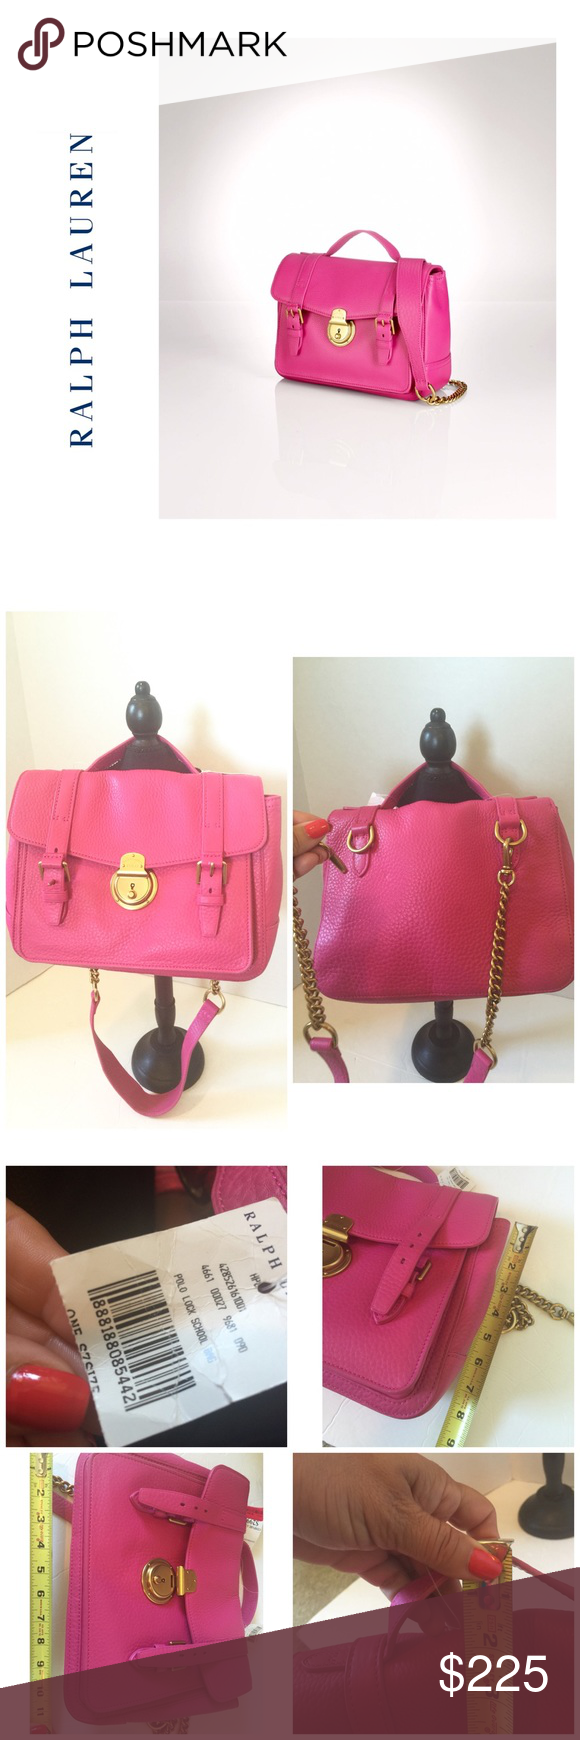 Selling this PRICE ⤵️Ralph Lauren Leather Pink Brass Lock Bag on Poshmark!  My… c4e240b916